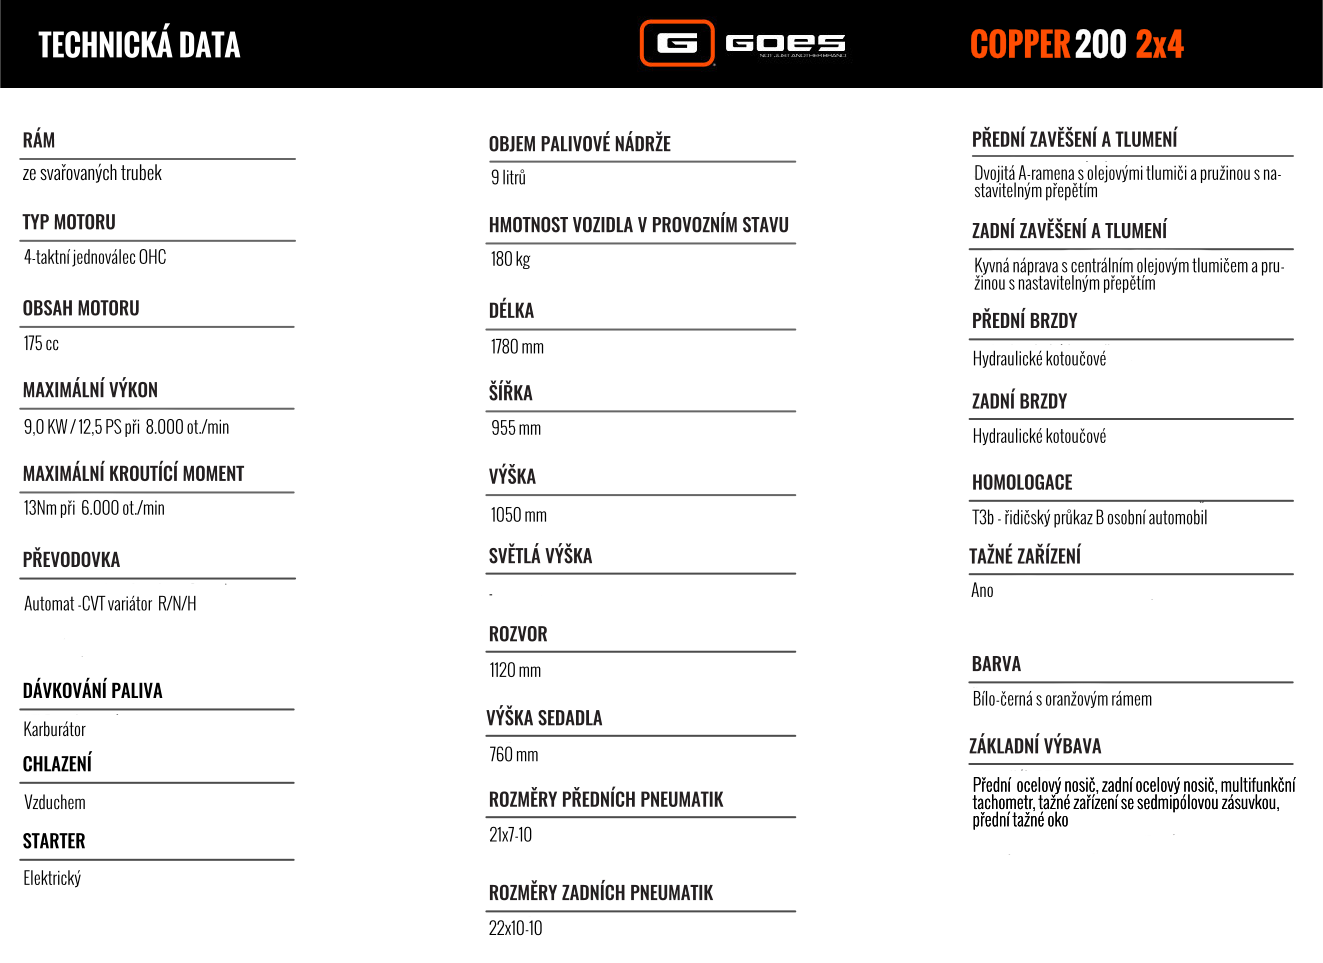 tech_data_goes_copper